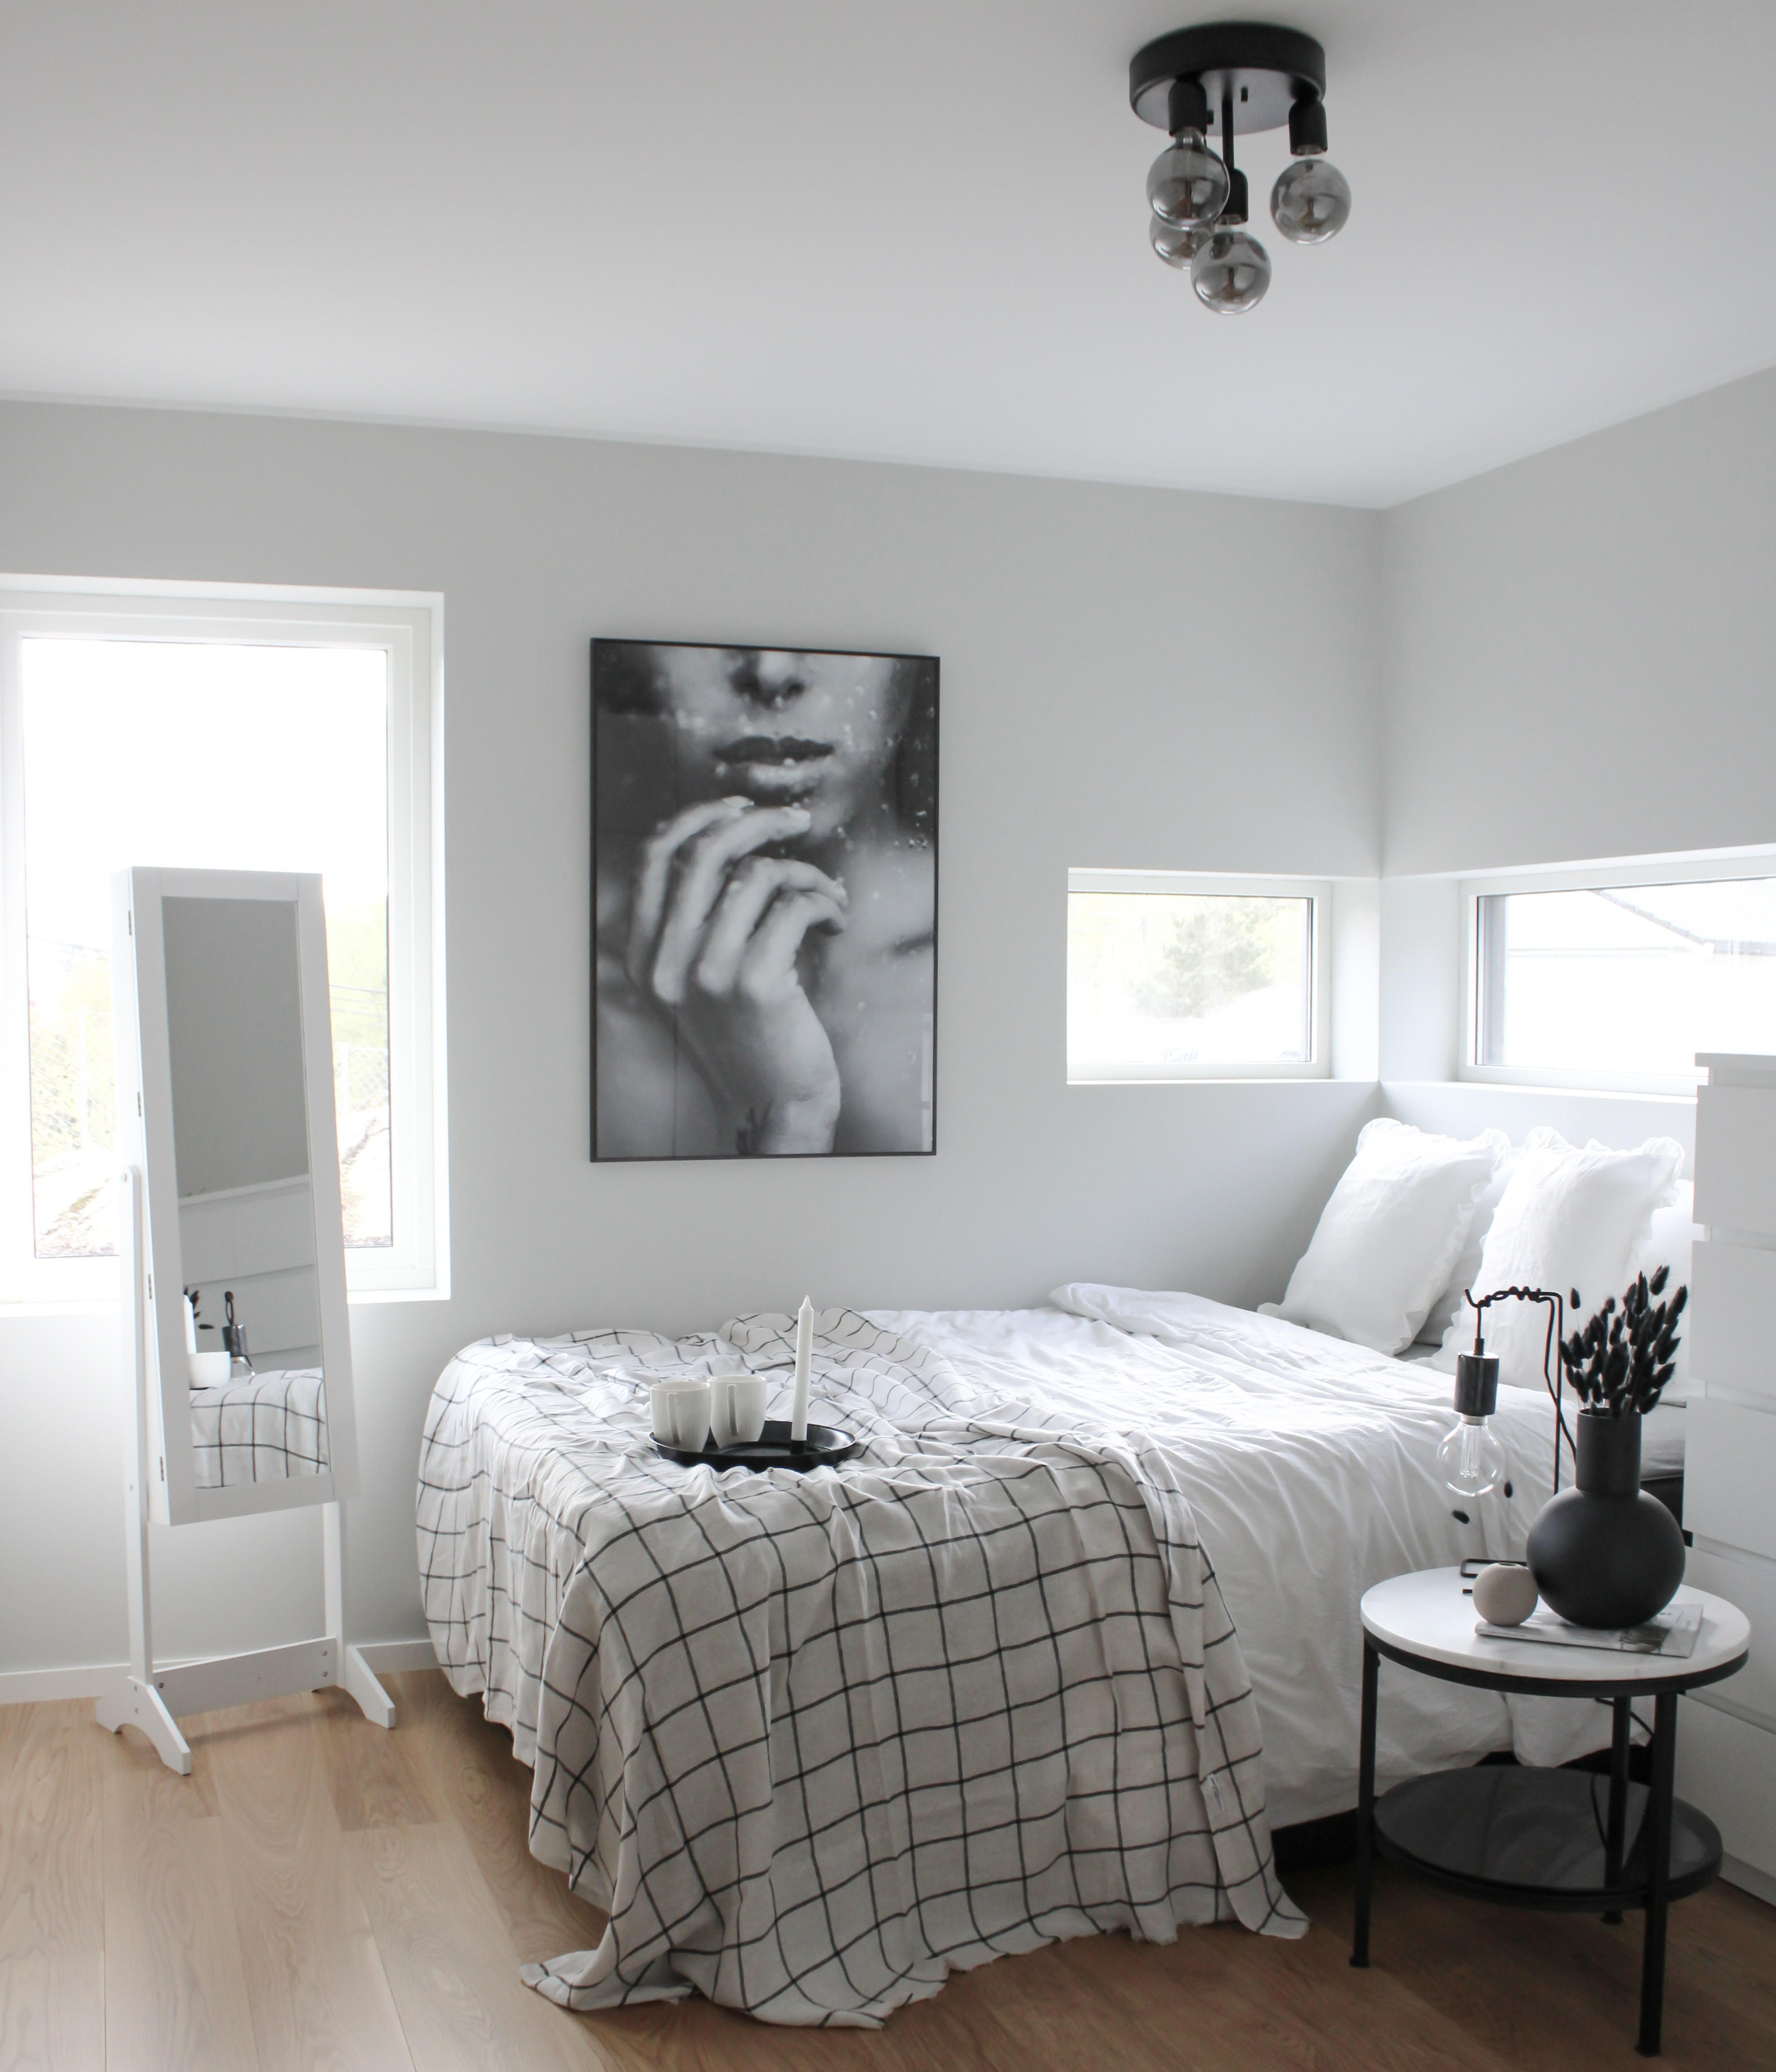 Fringe Bedspread Natural Linen blanket in King, Queen